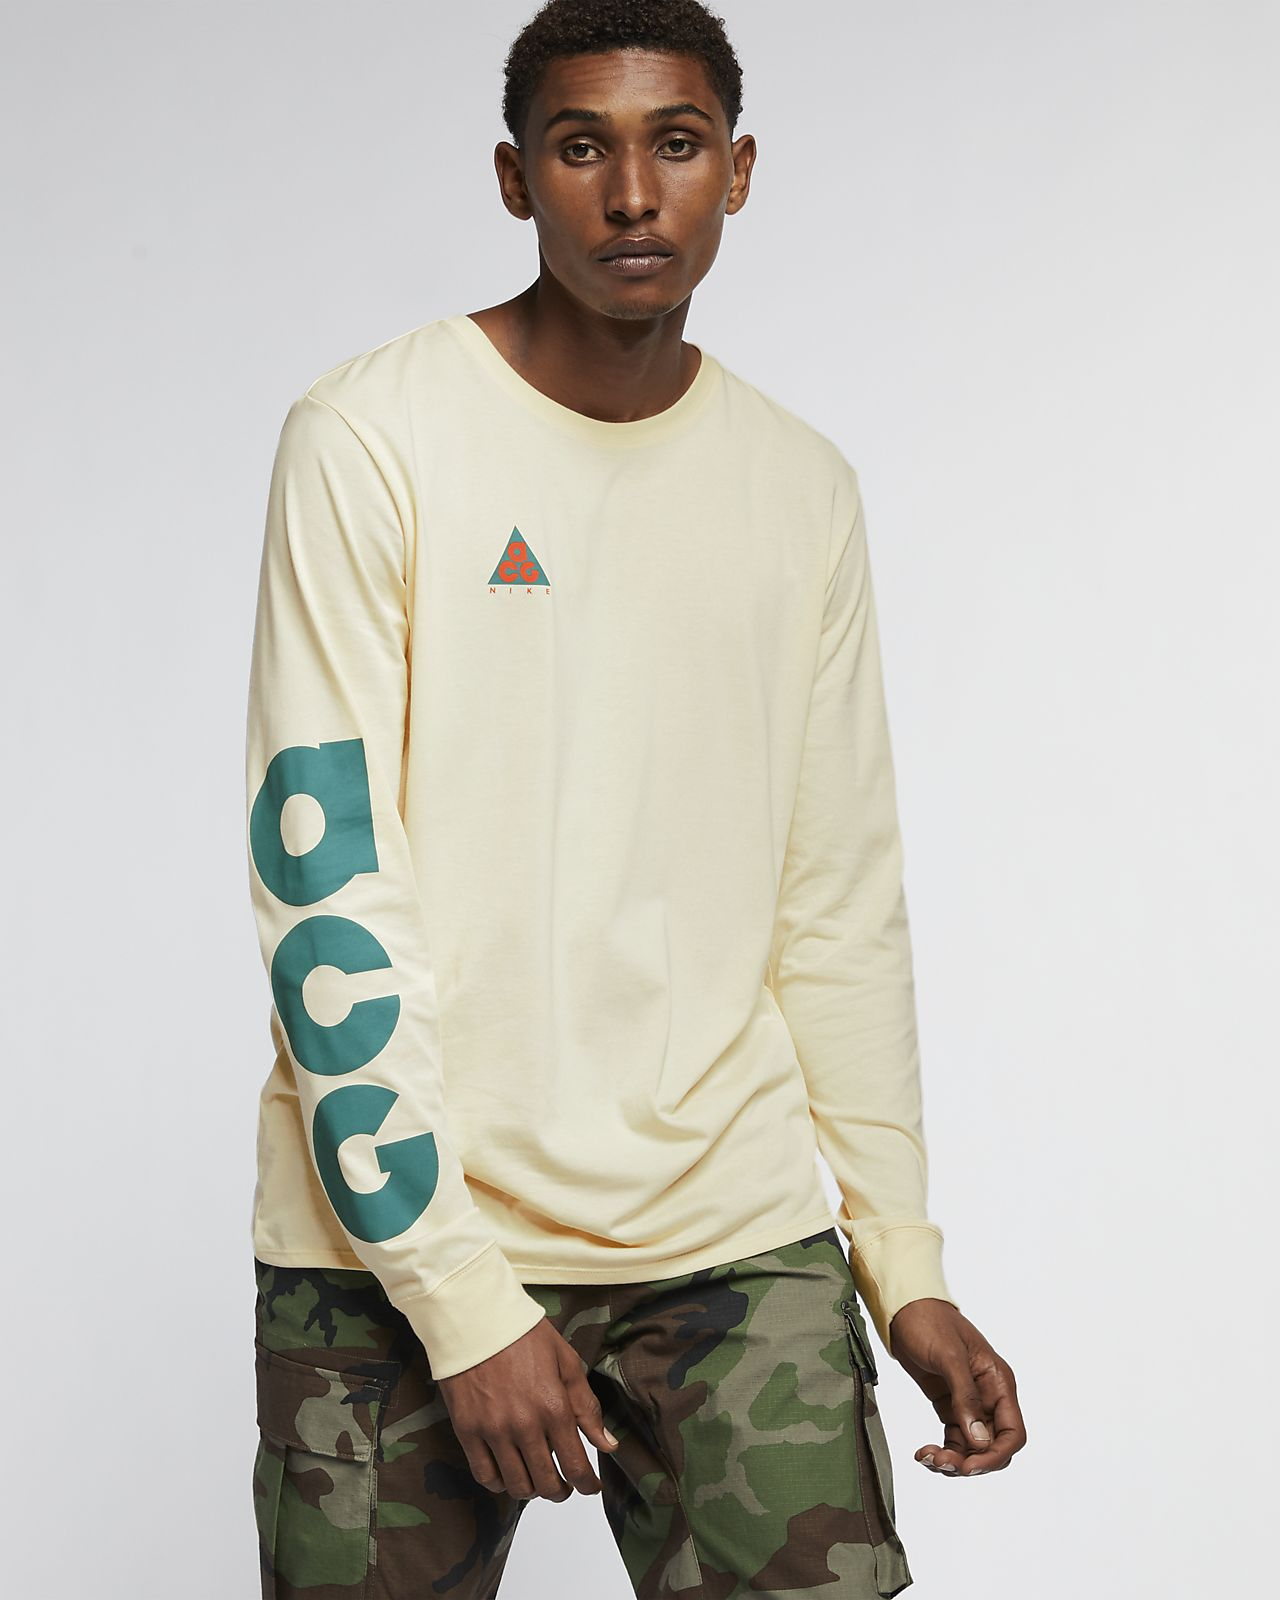 a41d047b Nike Sportswear ACG Long-Sleeve T-Shirt. Nike.com